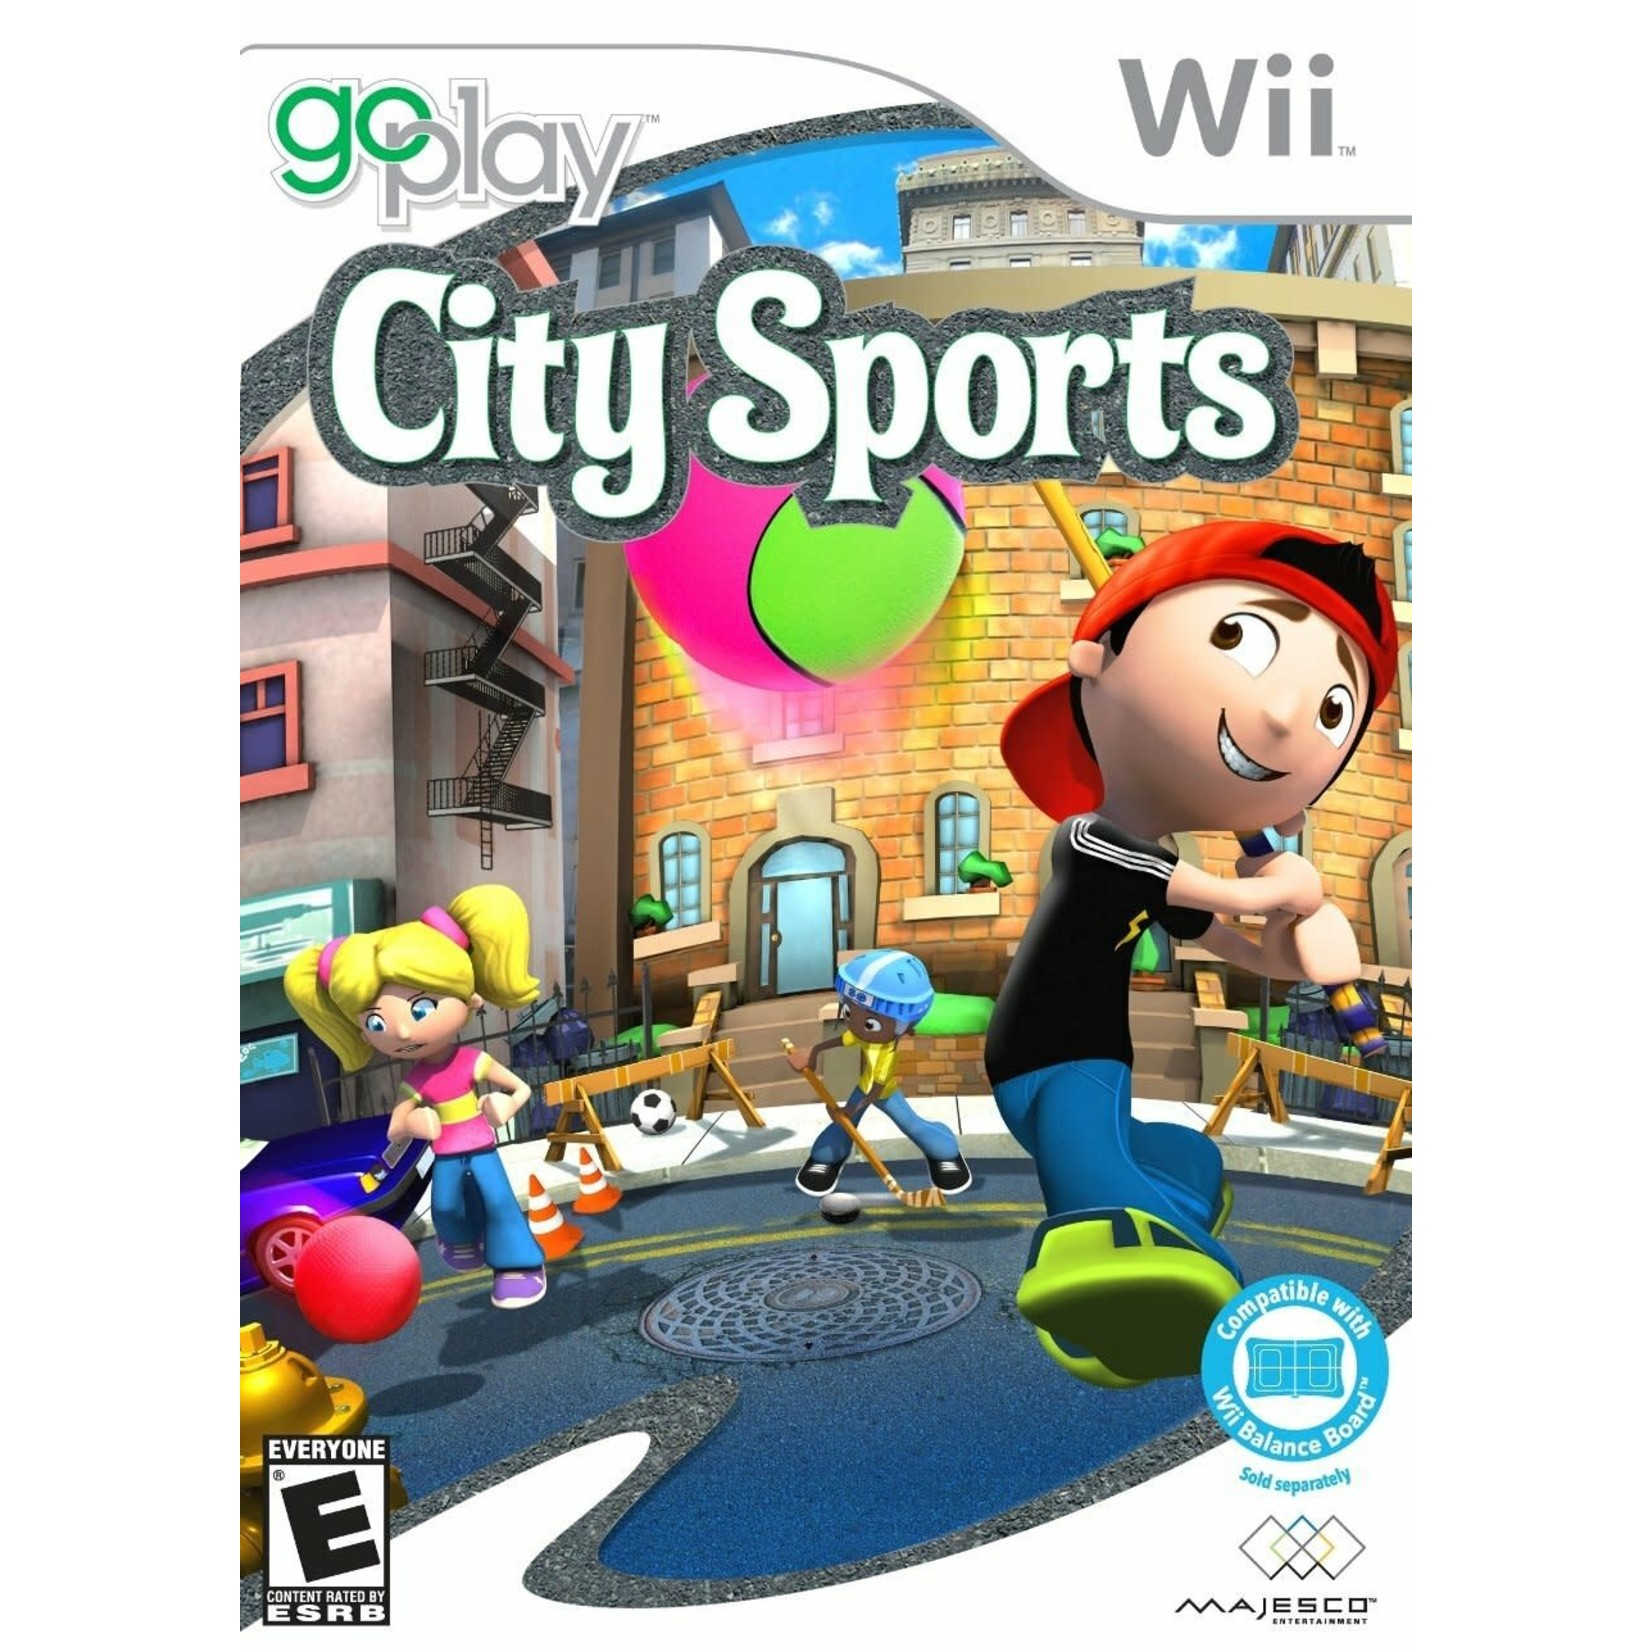 WIIUSD-Go Play City Sports